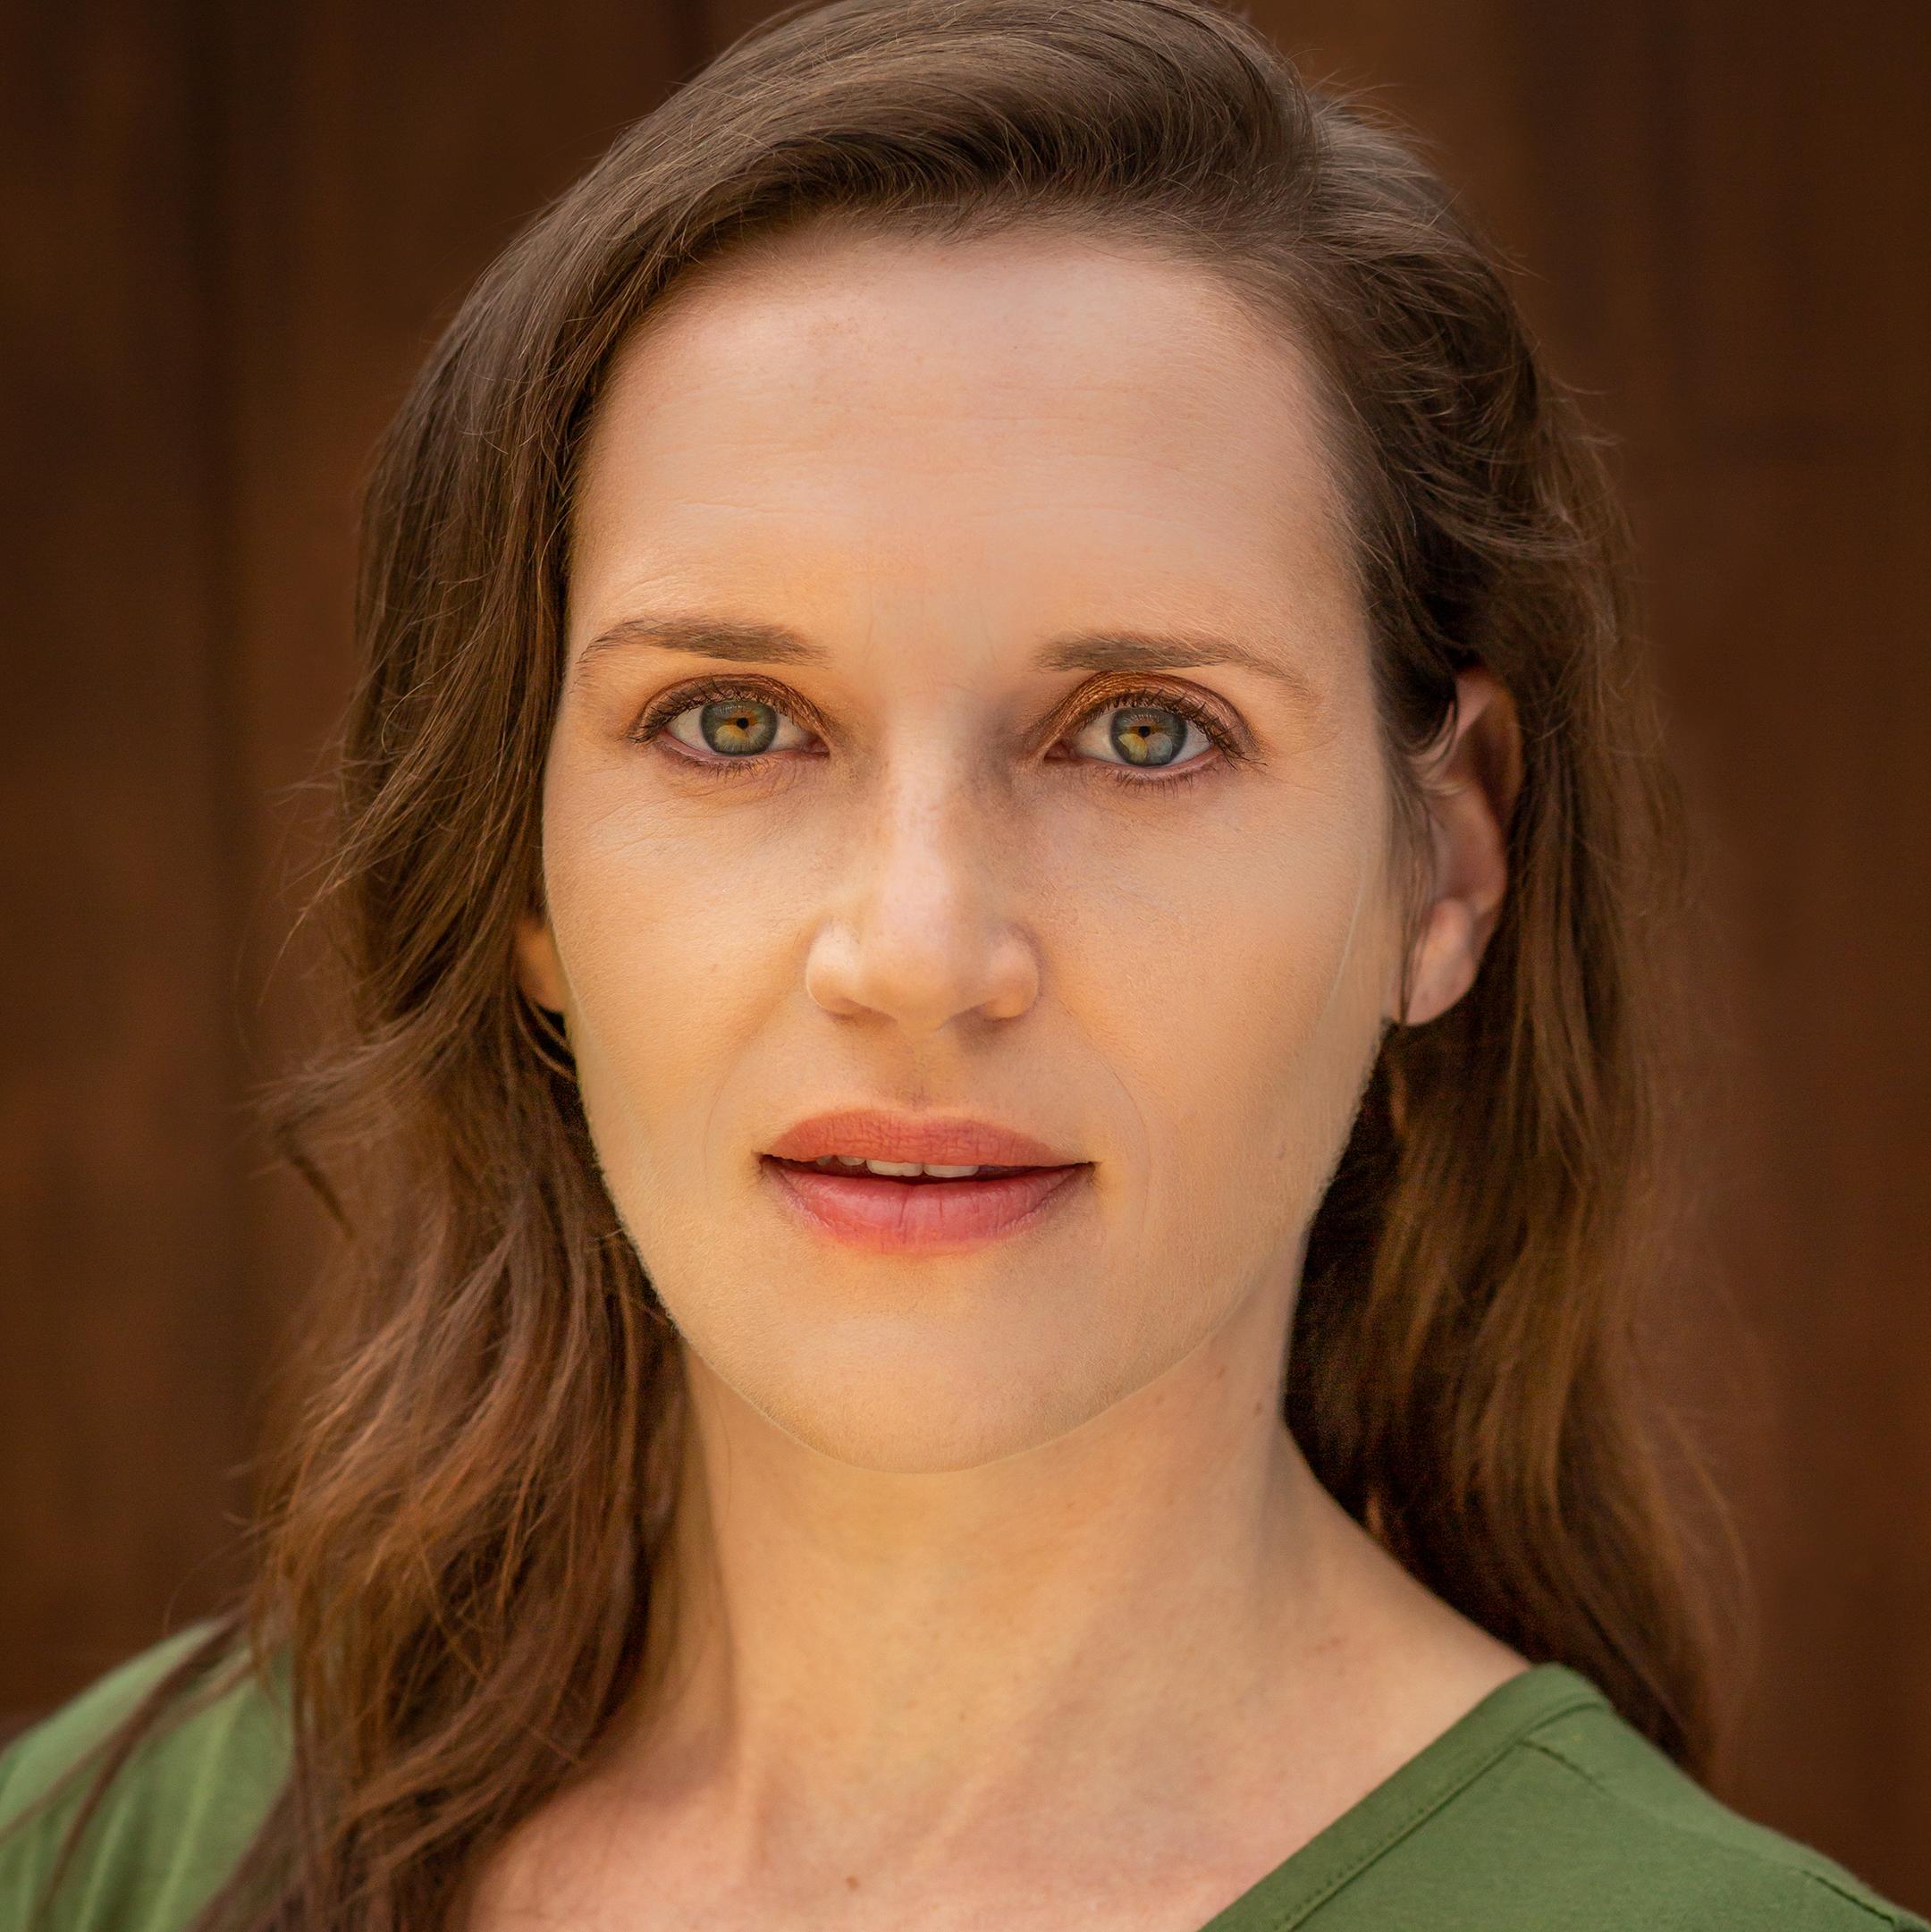 Melanie Tornroth